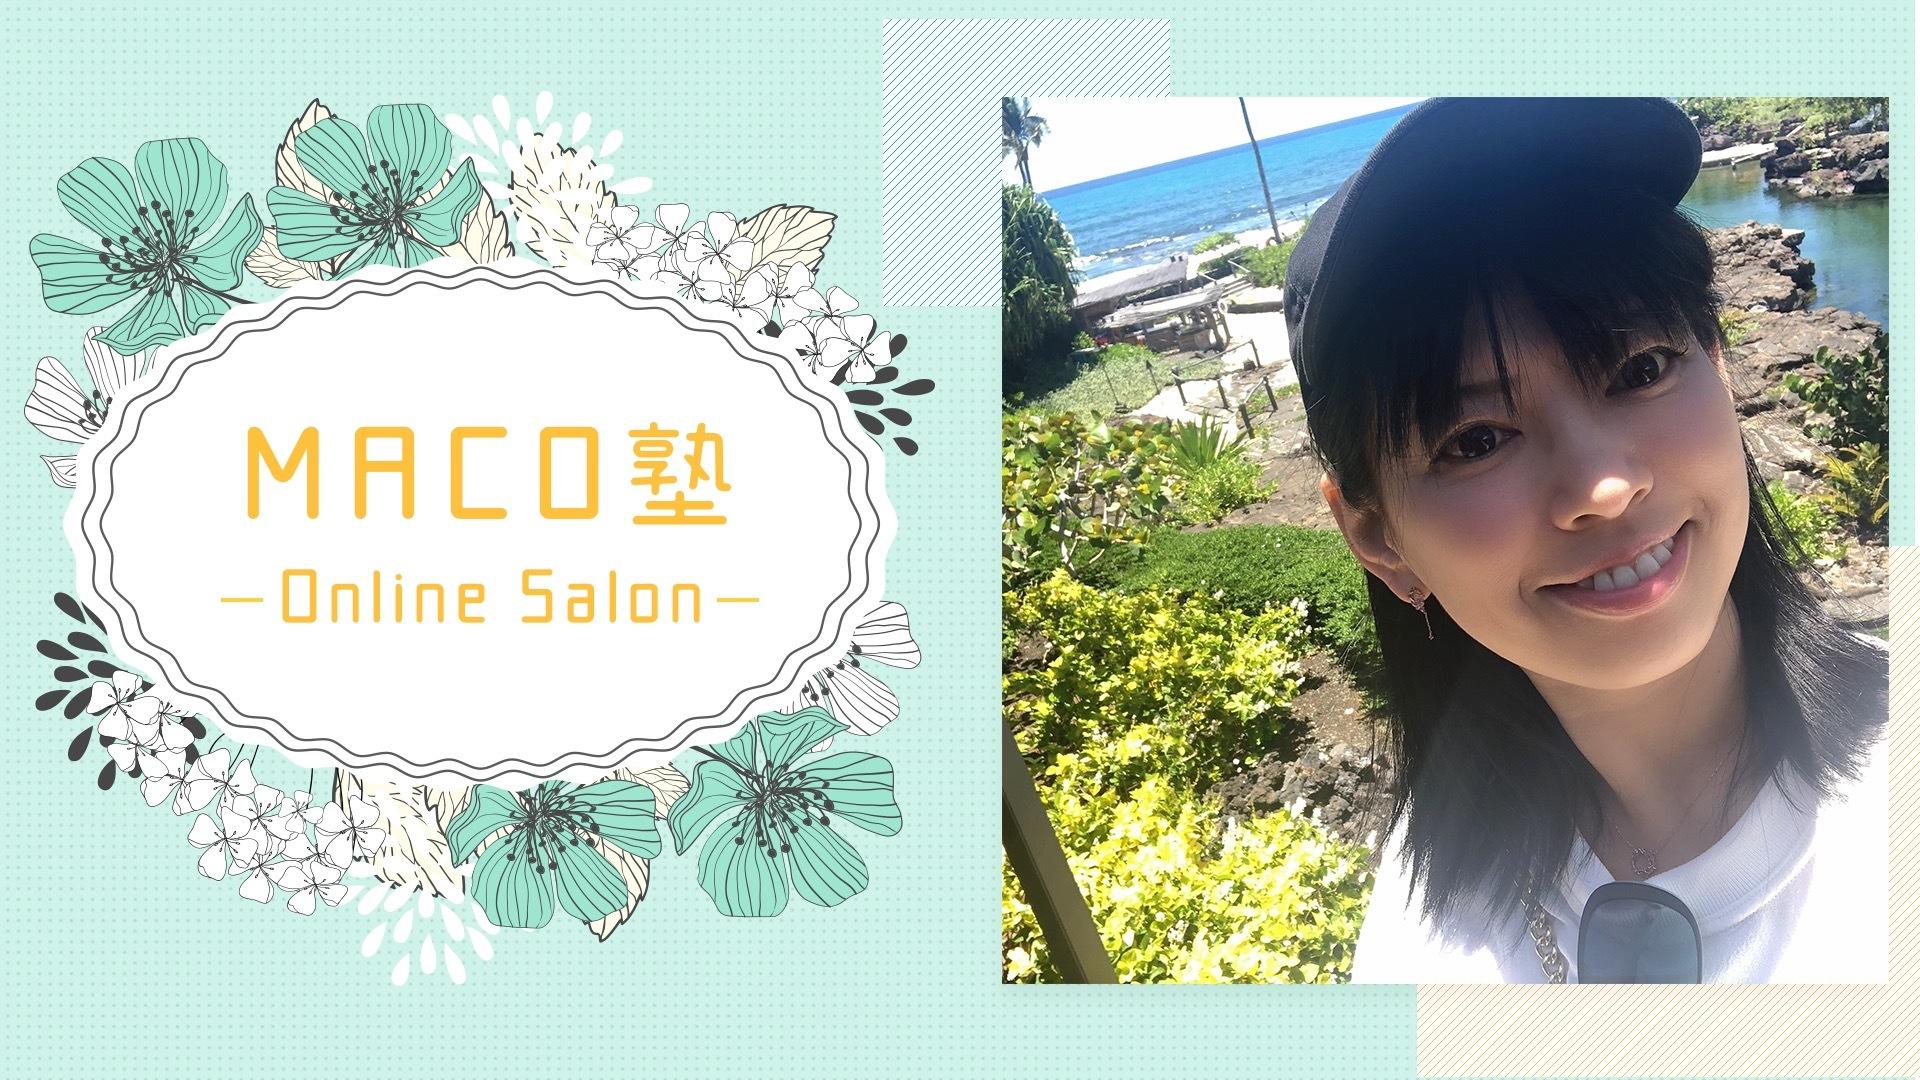 MACOオンラインサロン  MACO塾